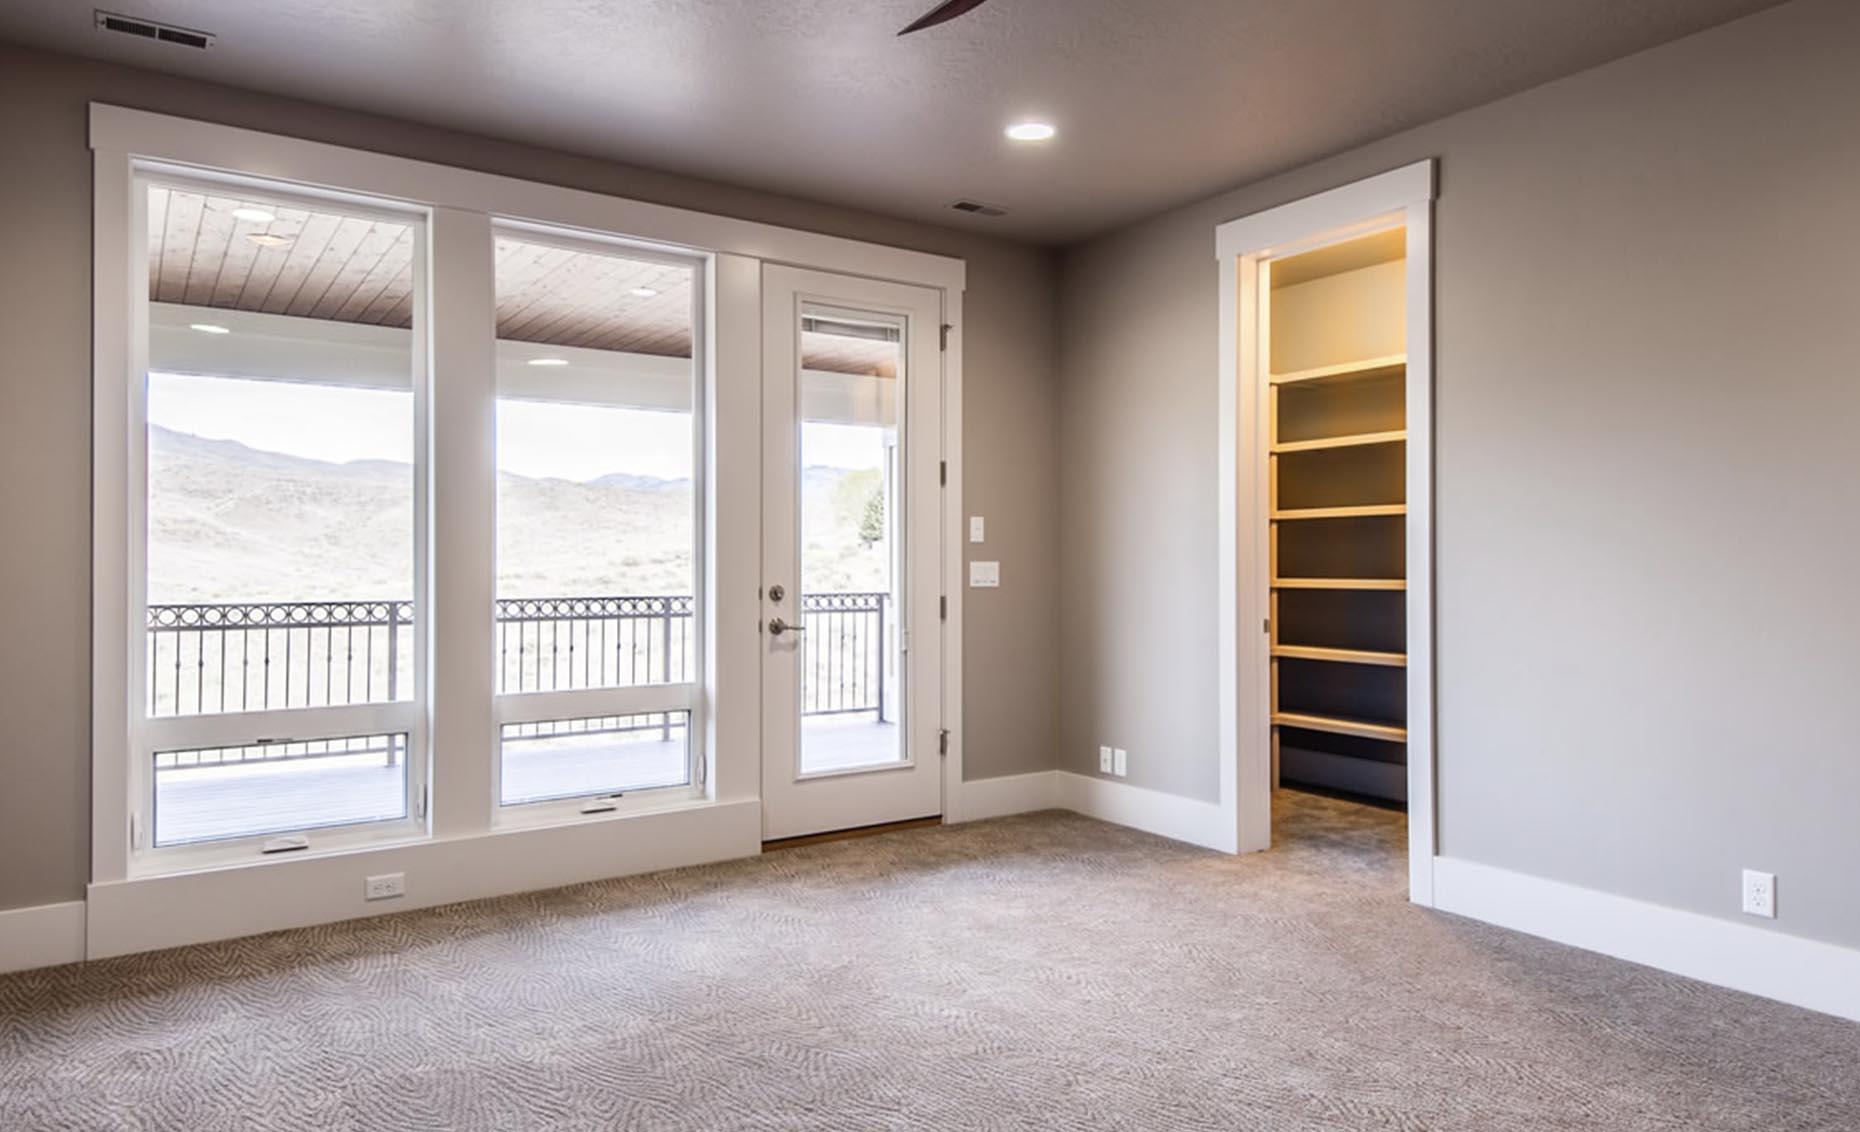 The Heavens Way House Bedroom